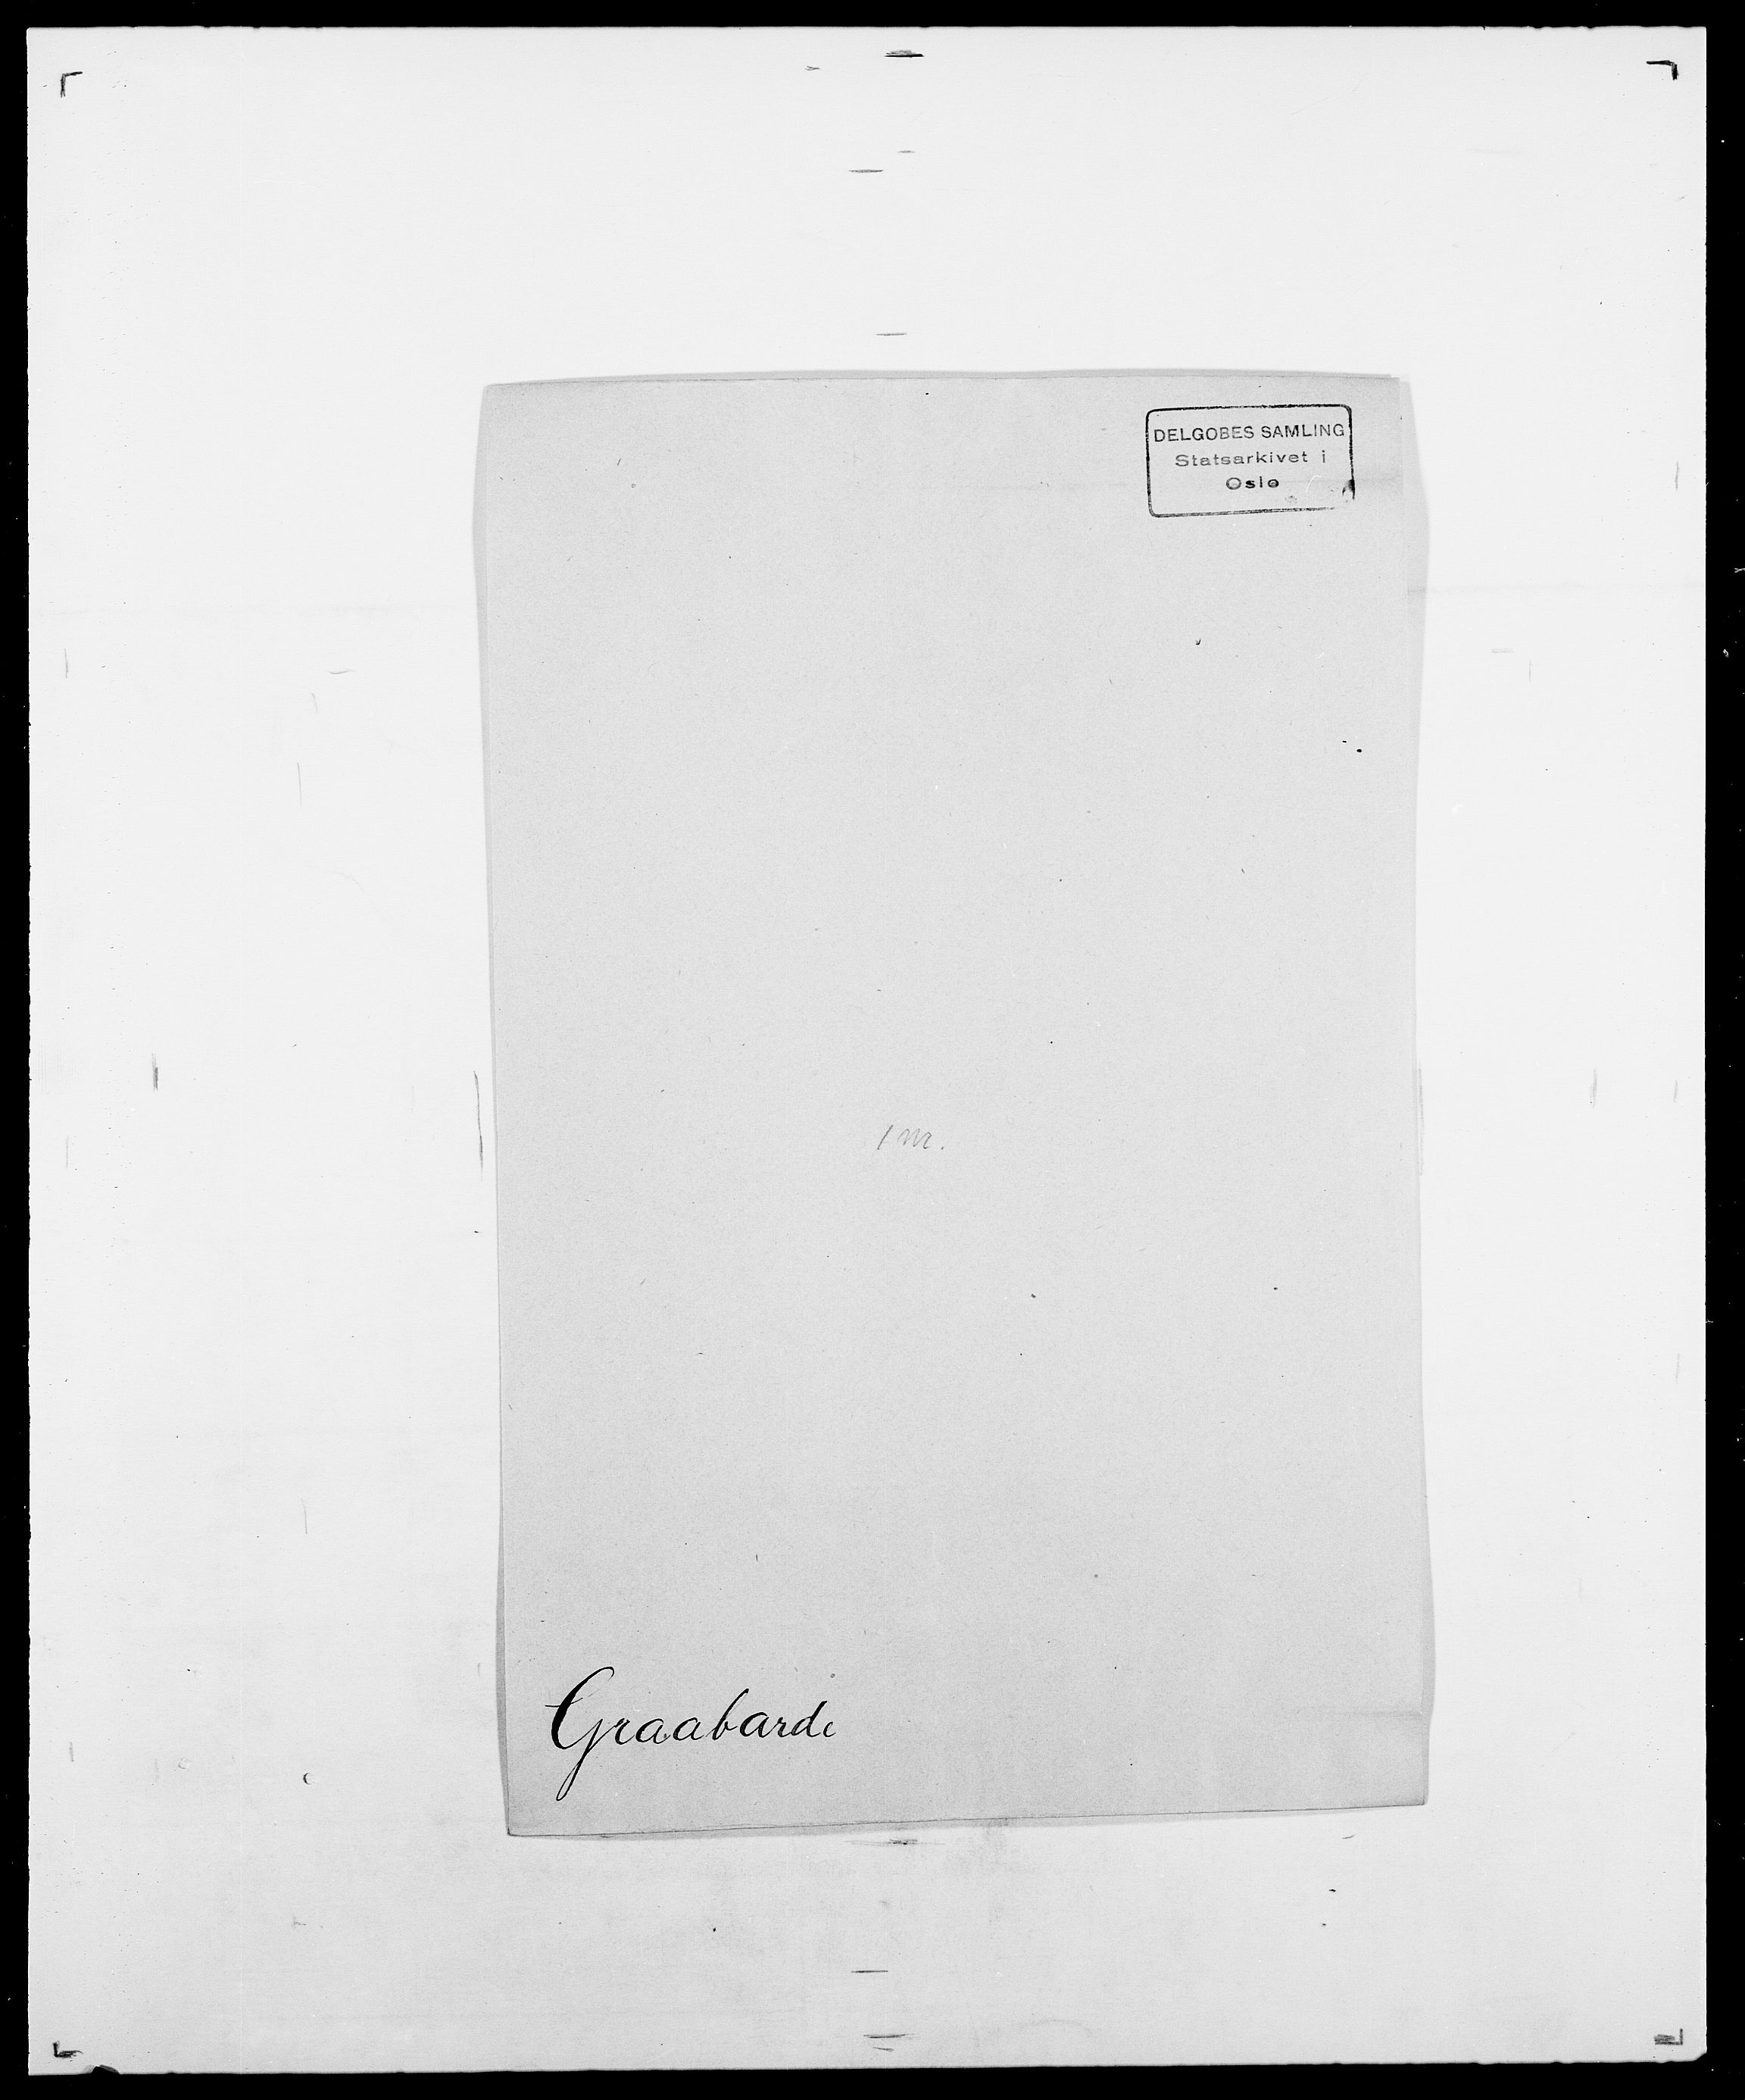 SAO, Delgobe, Charles Antoine - samling, D/Da/L0014: Giebdhausen - Grip, s. 446